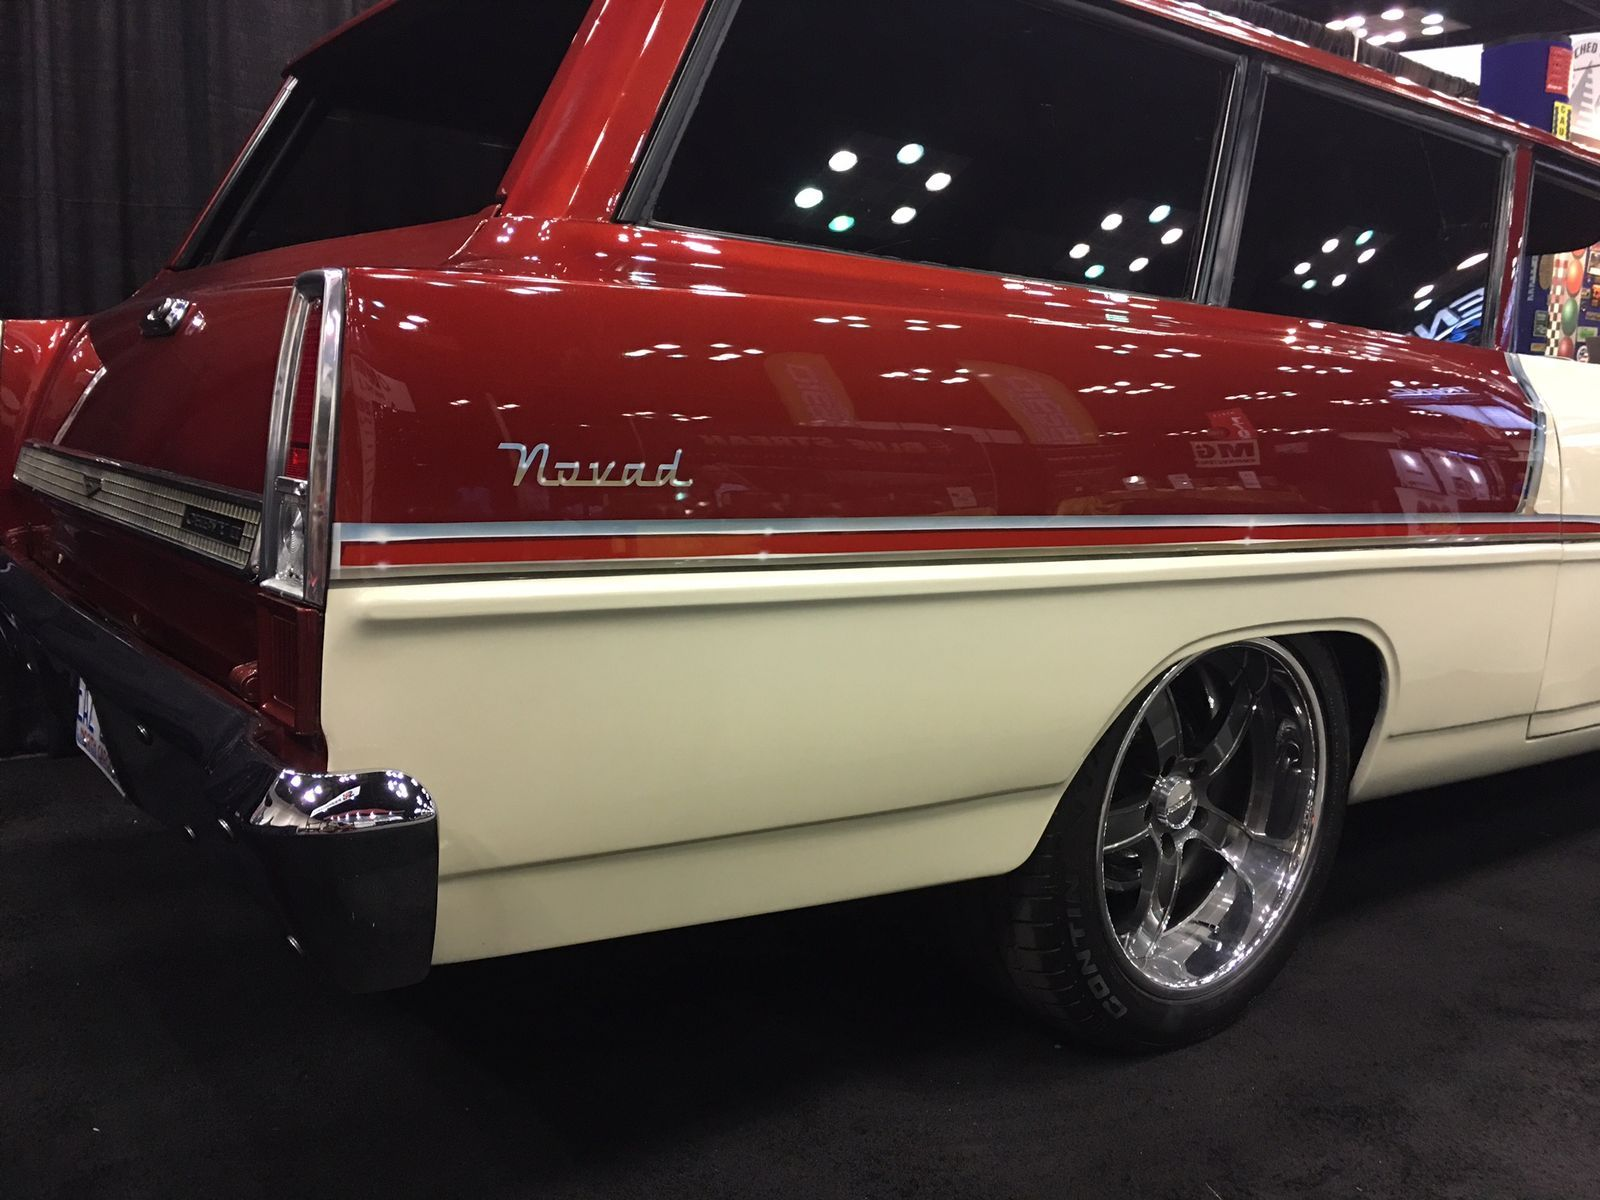 1966 Chevrolet Nova | Rob & Pam Aquilina's